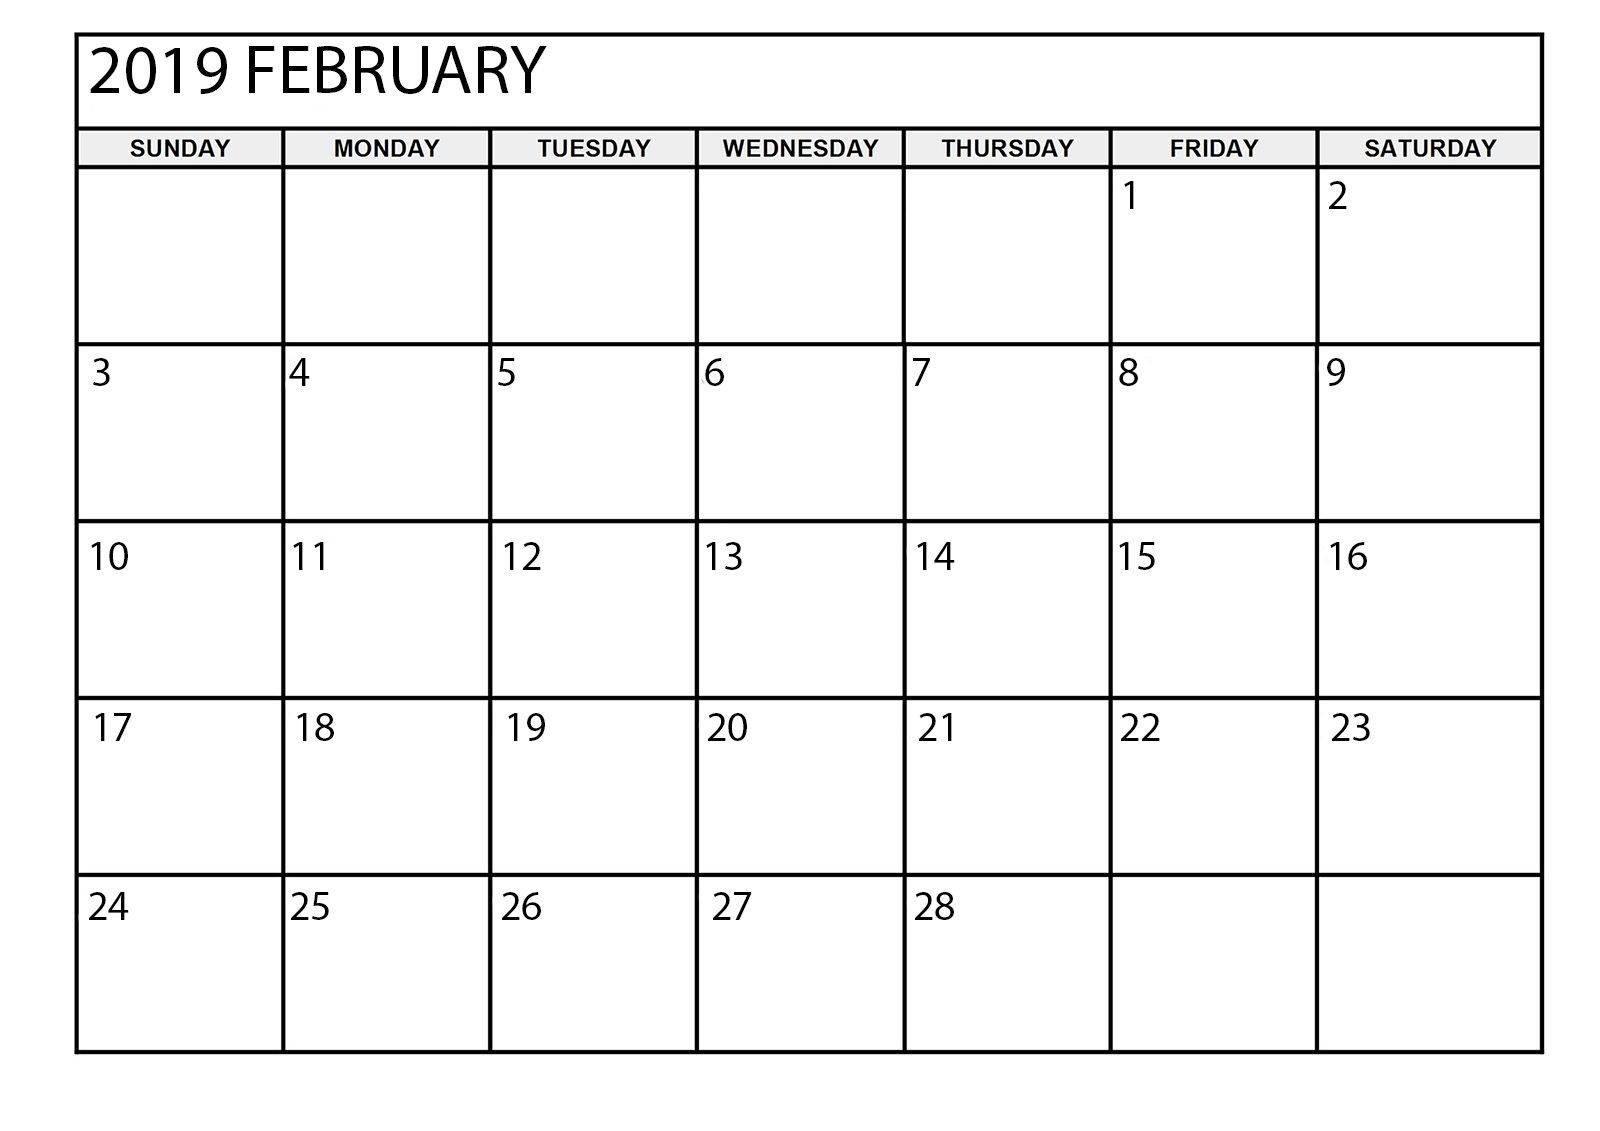 February 2019 Calendar Printable Large